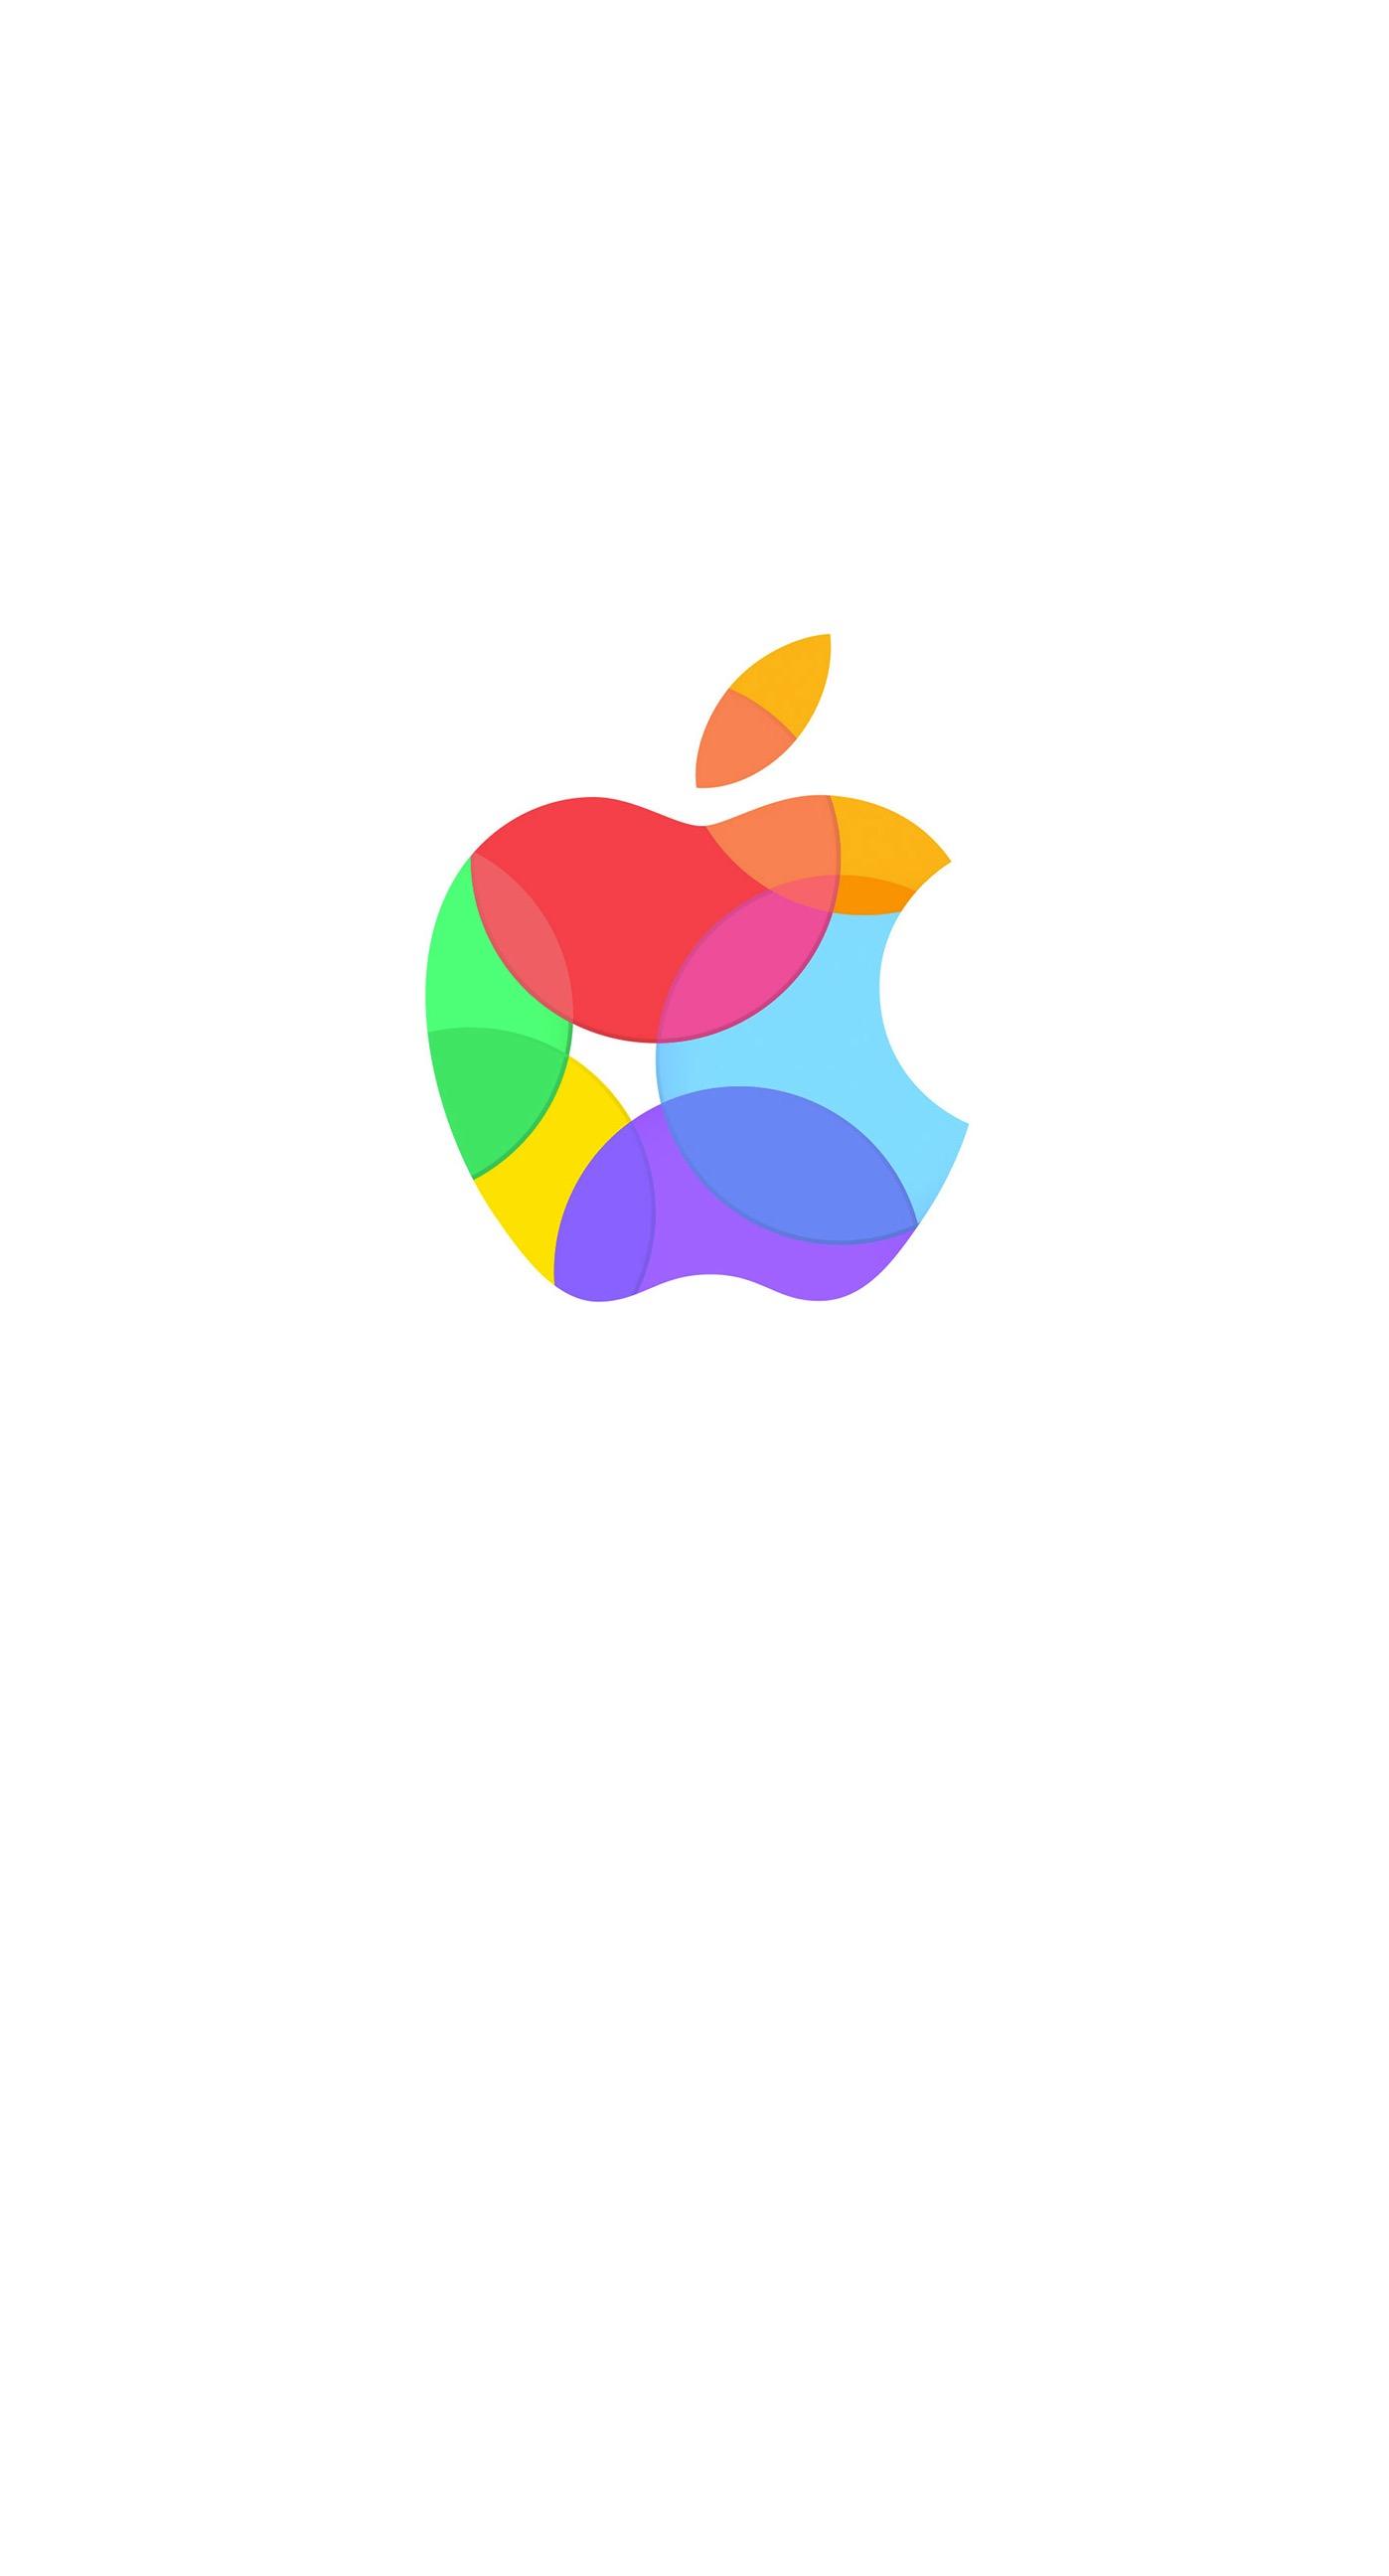 Download 200+ Wallpaper Apple Iphone 6 Plus HD Paling Keren